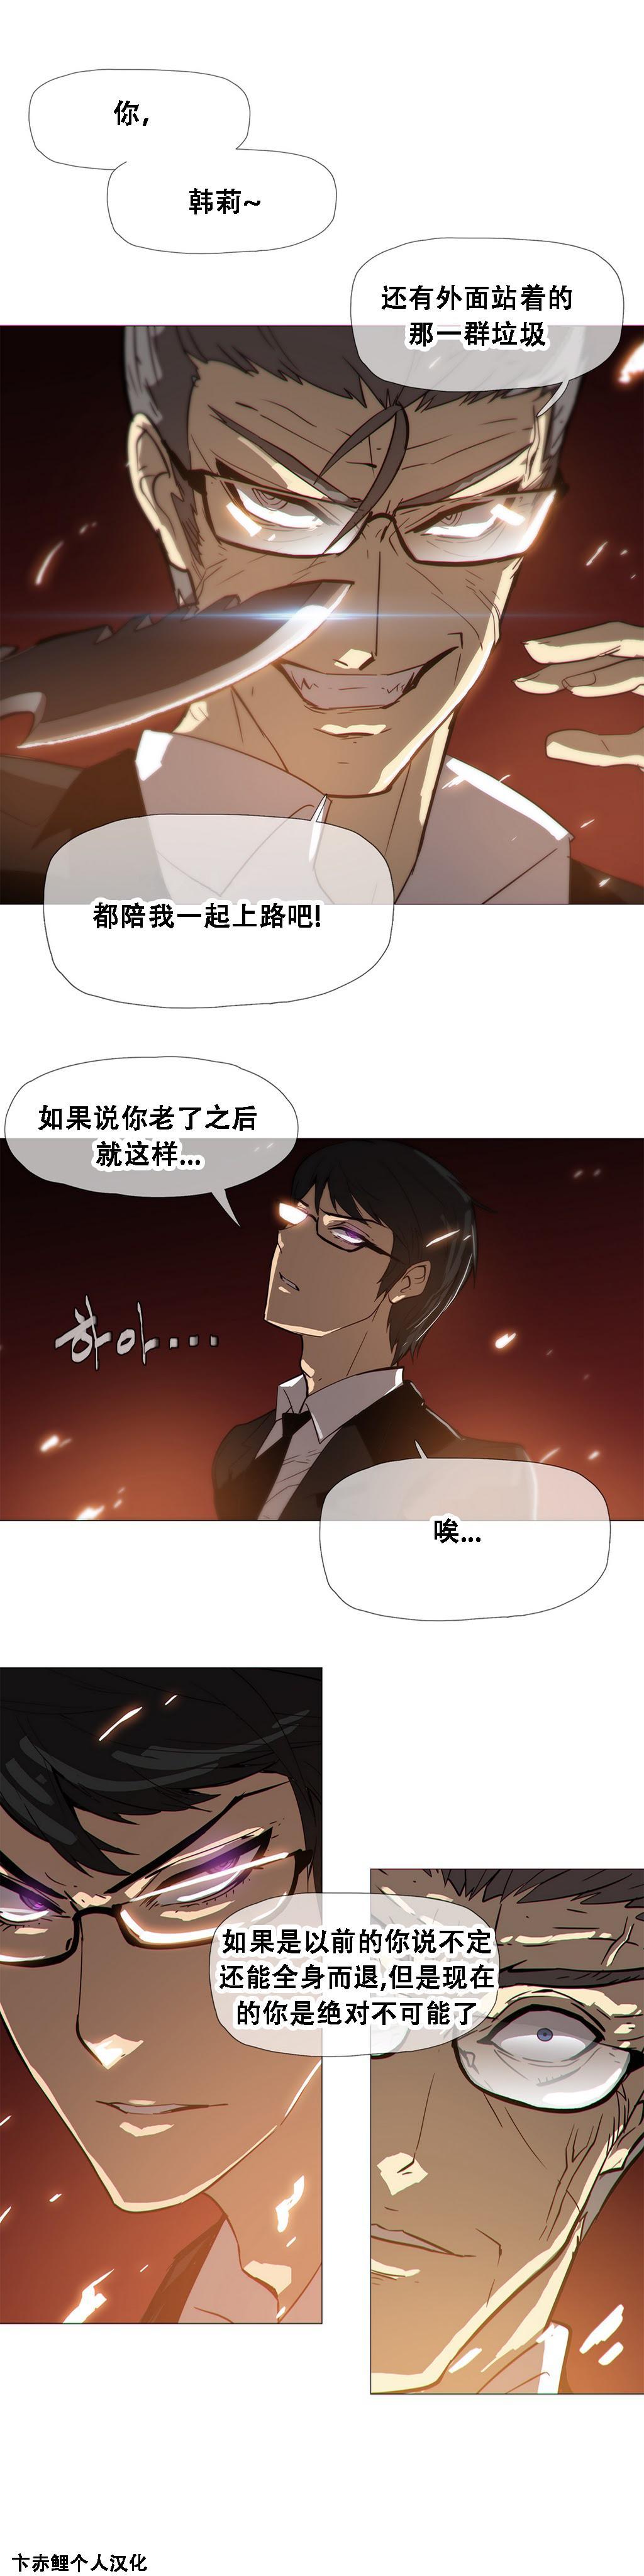 HouseHold Affairs 【卞赤鲤个人汉化】1~21话(持续更新中) 382